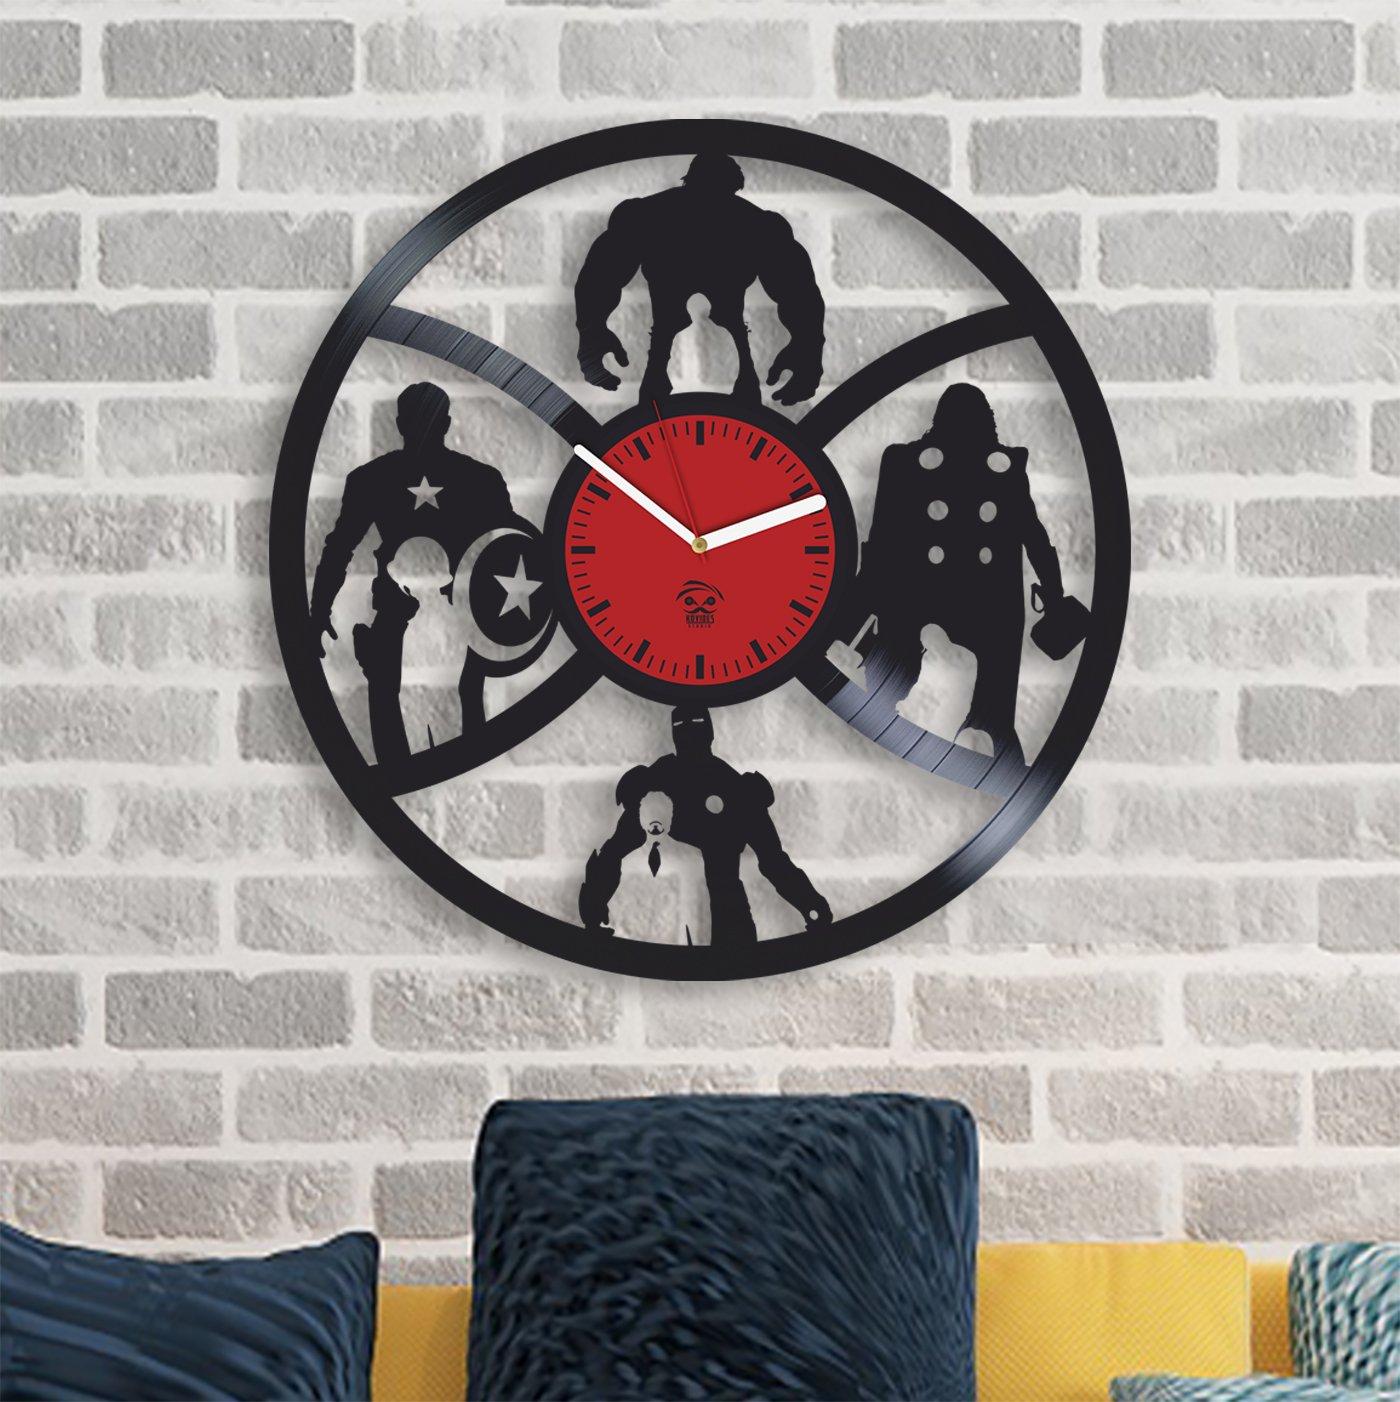 Amazon.com: Kovides The Avengers Clock, Earths Mightiest Heroes, Iron Man, Hulk, Vinyl Wall Clock, Comics Marvel DC Movie, Vinyl Wall Clock, ...